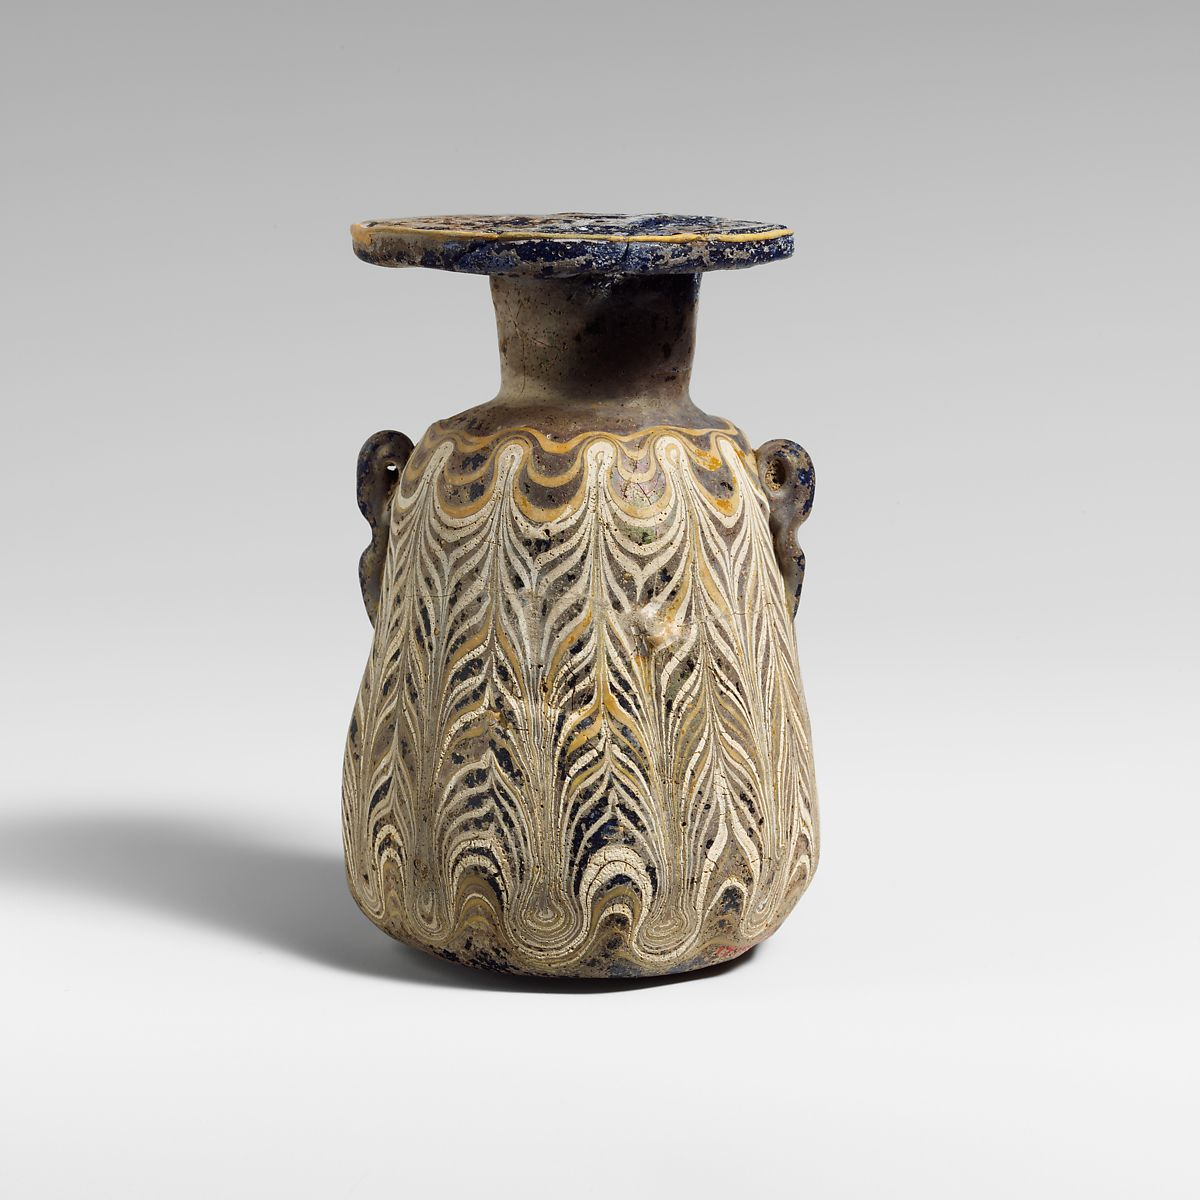 Glass squat alabastron (perfume bottle) | Greek, Eastern Mediterranean or Italian | Hellenistic | The Met